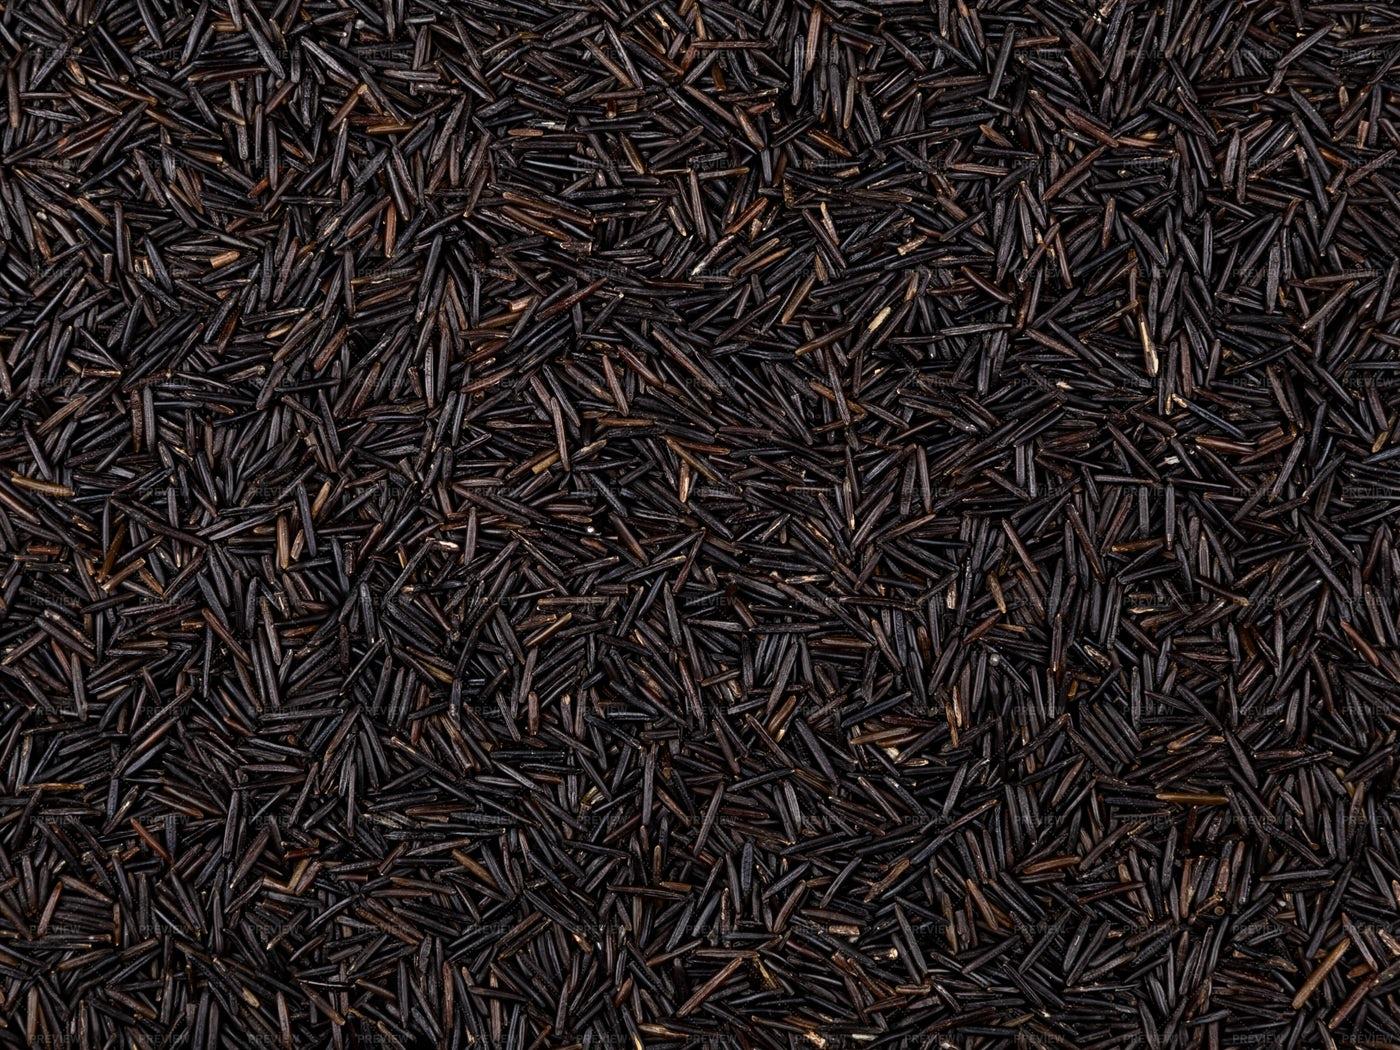 Black Rice Background: Stock Photos